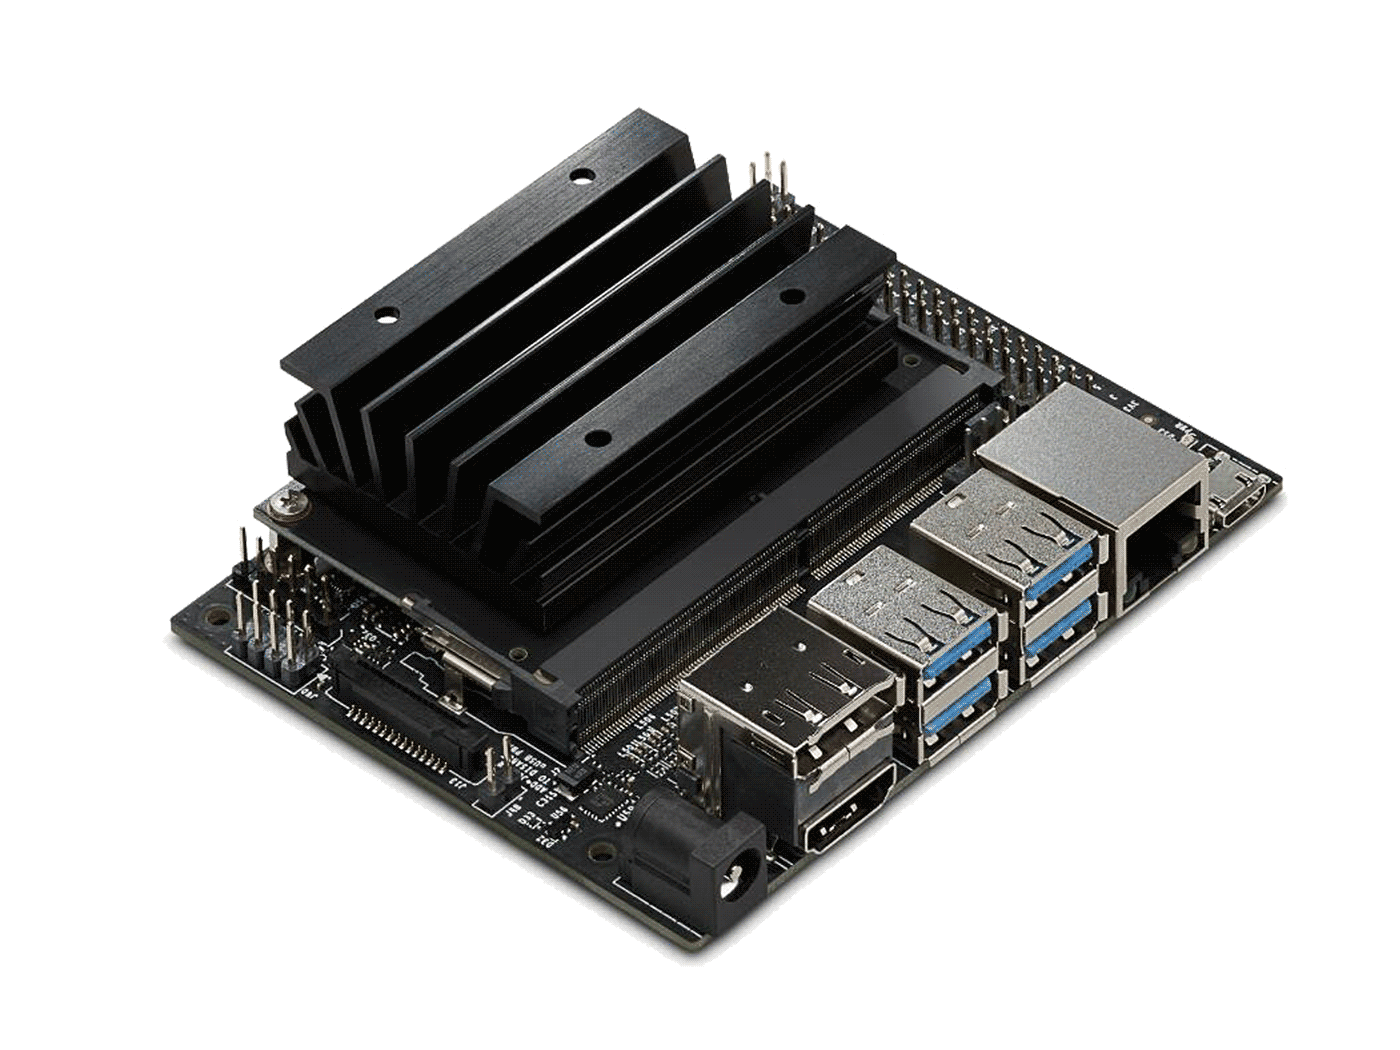 The NVIDIA Jetson Nano Developer Kit, a powerful SBC smaller